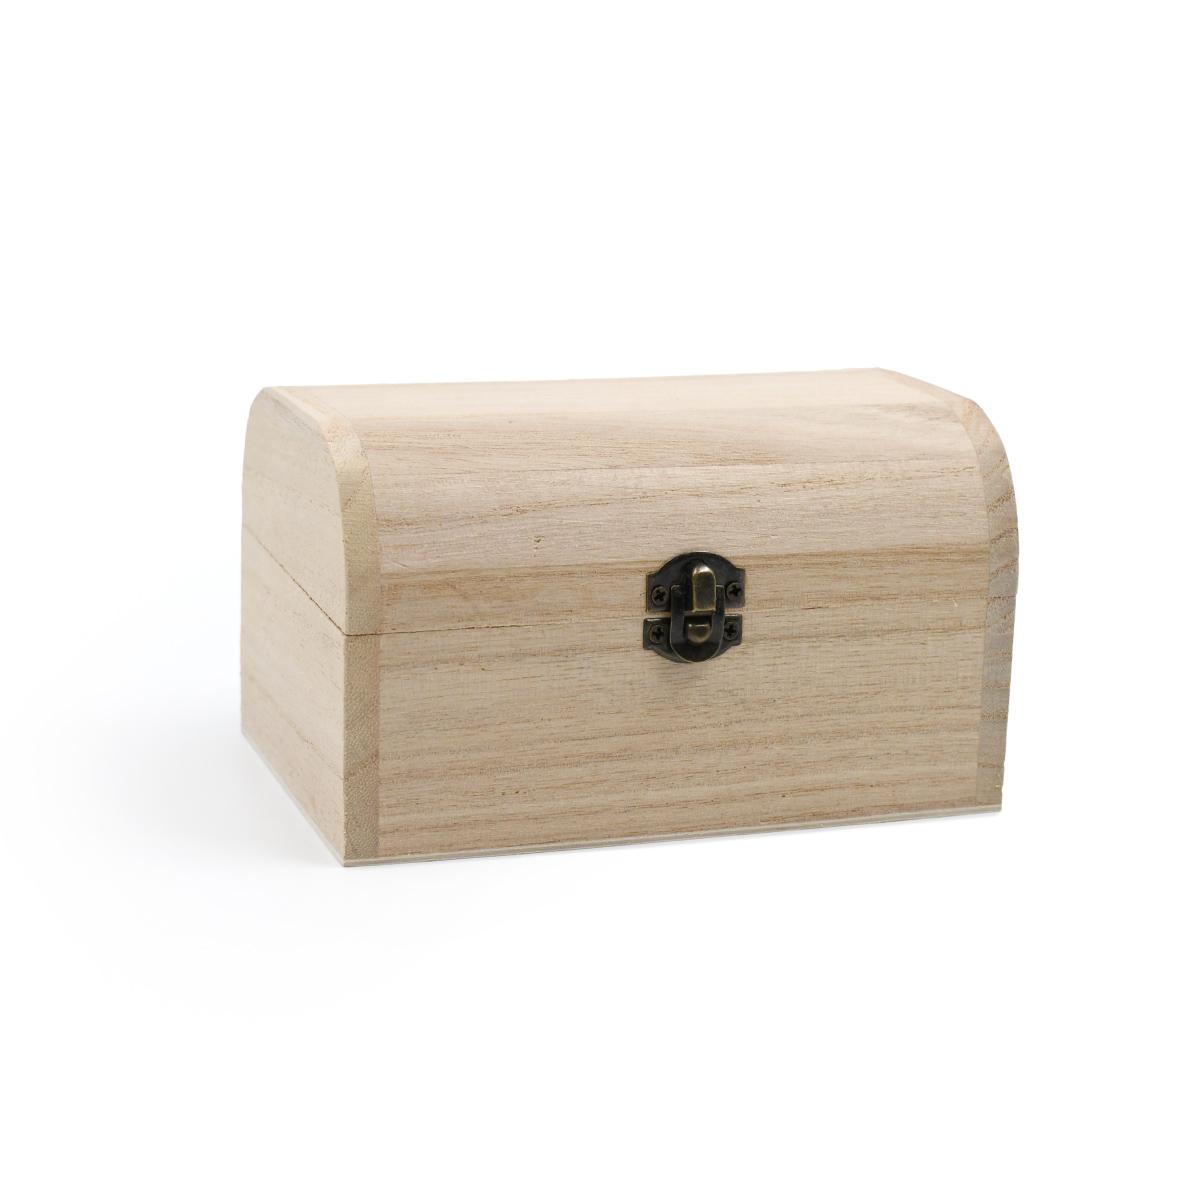 LYC1604-377 Шкатулка деревянная, 14*10*8см